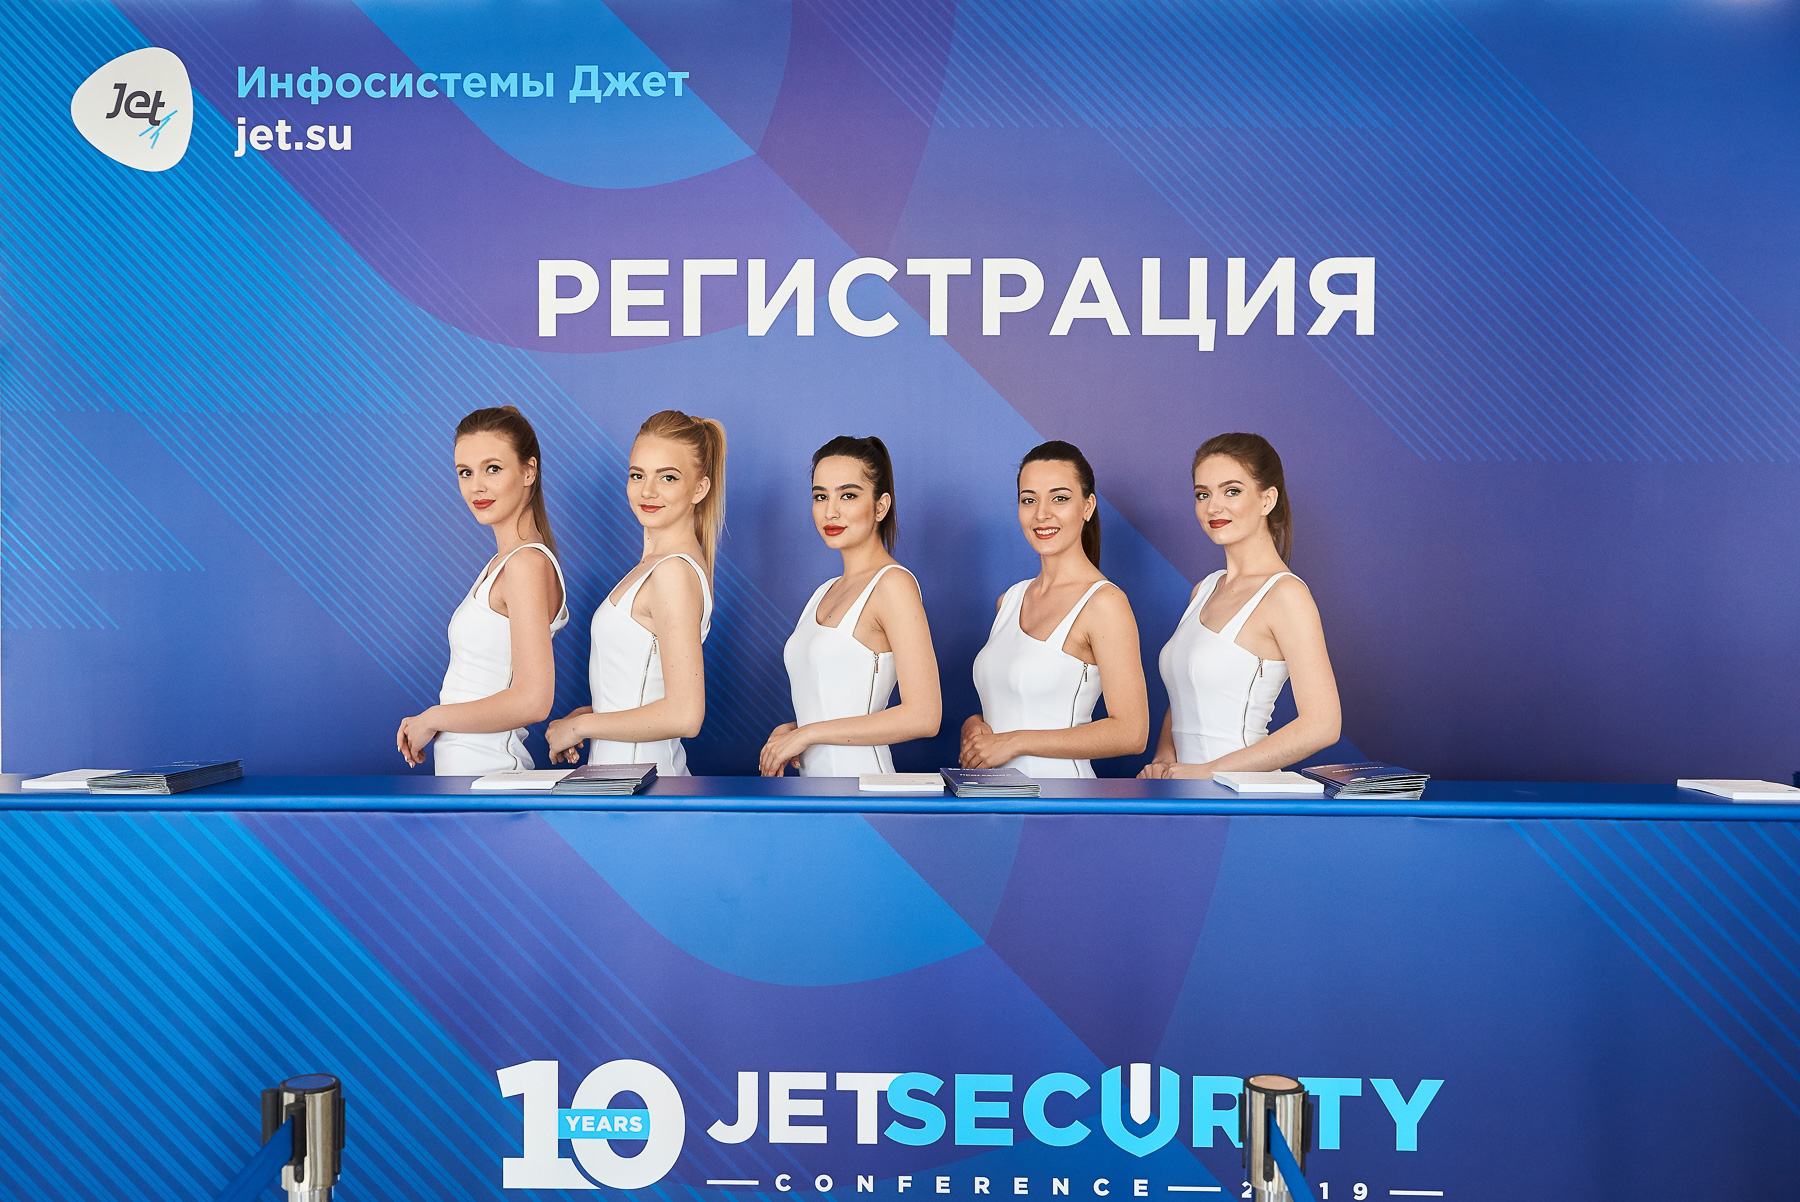 2019-06-06 Jet 002